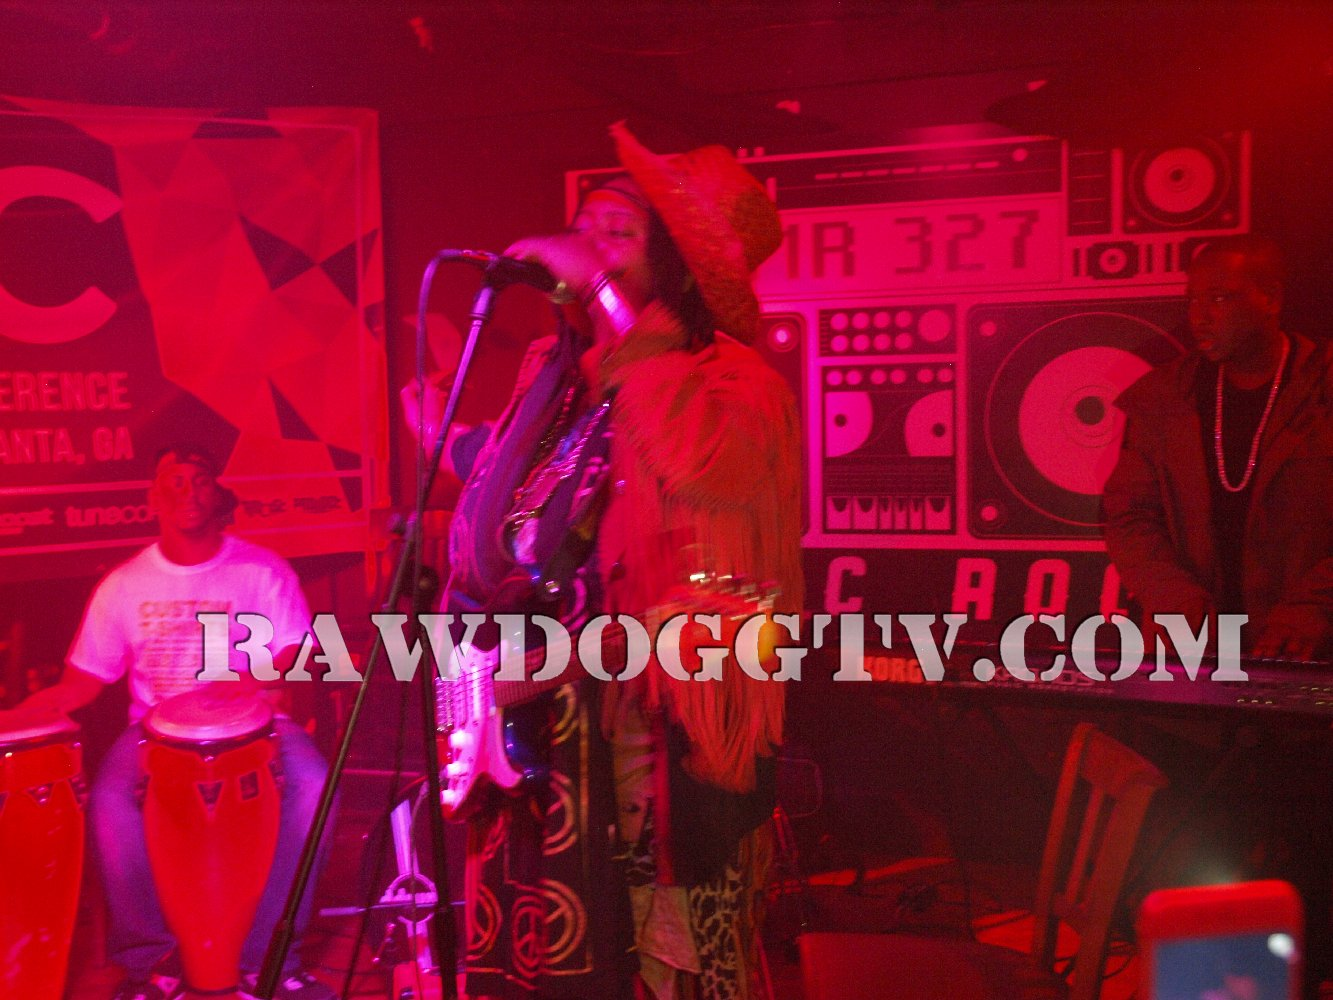 ashley-reid-a3c-ashley-reid-bet-hip-hop-awards-lareid-pebblesaaron-reid-epic-records-meetings-ar-ashley-reid-atlanta-entertainment-rawdoggtv-305-490-2182-10